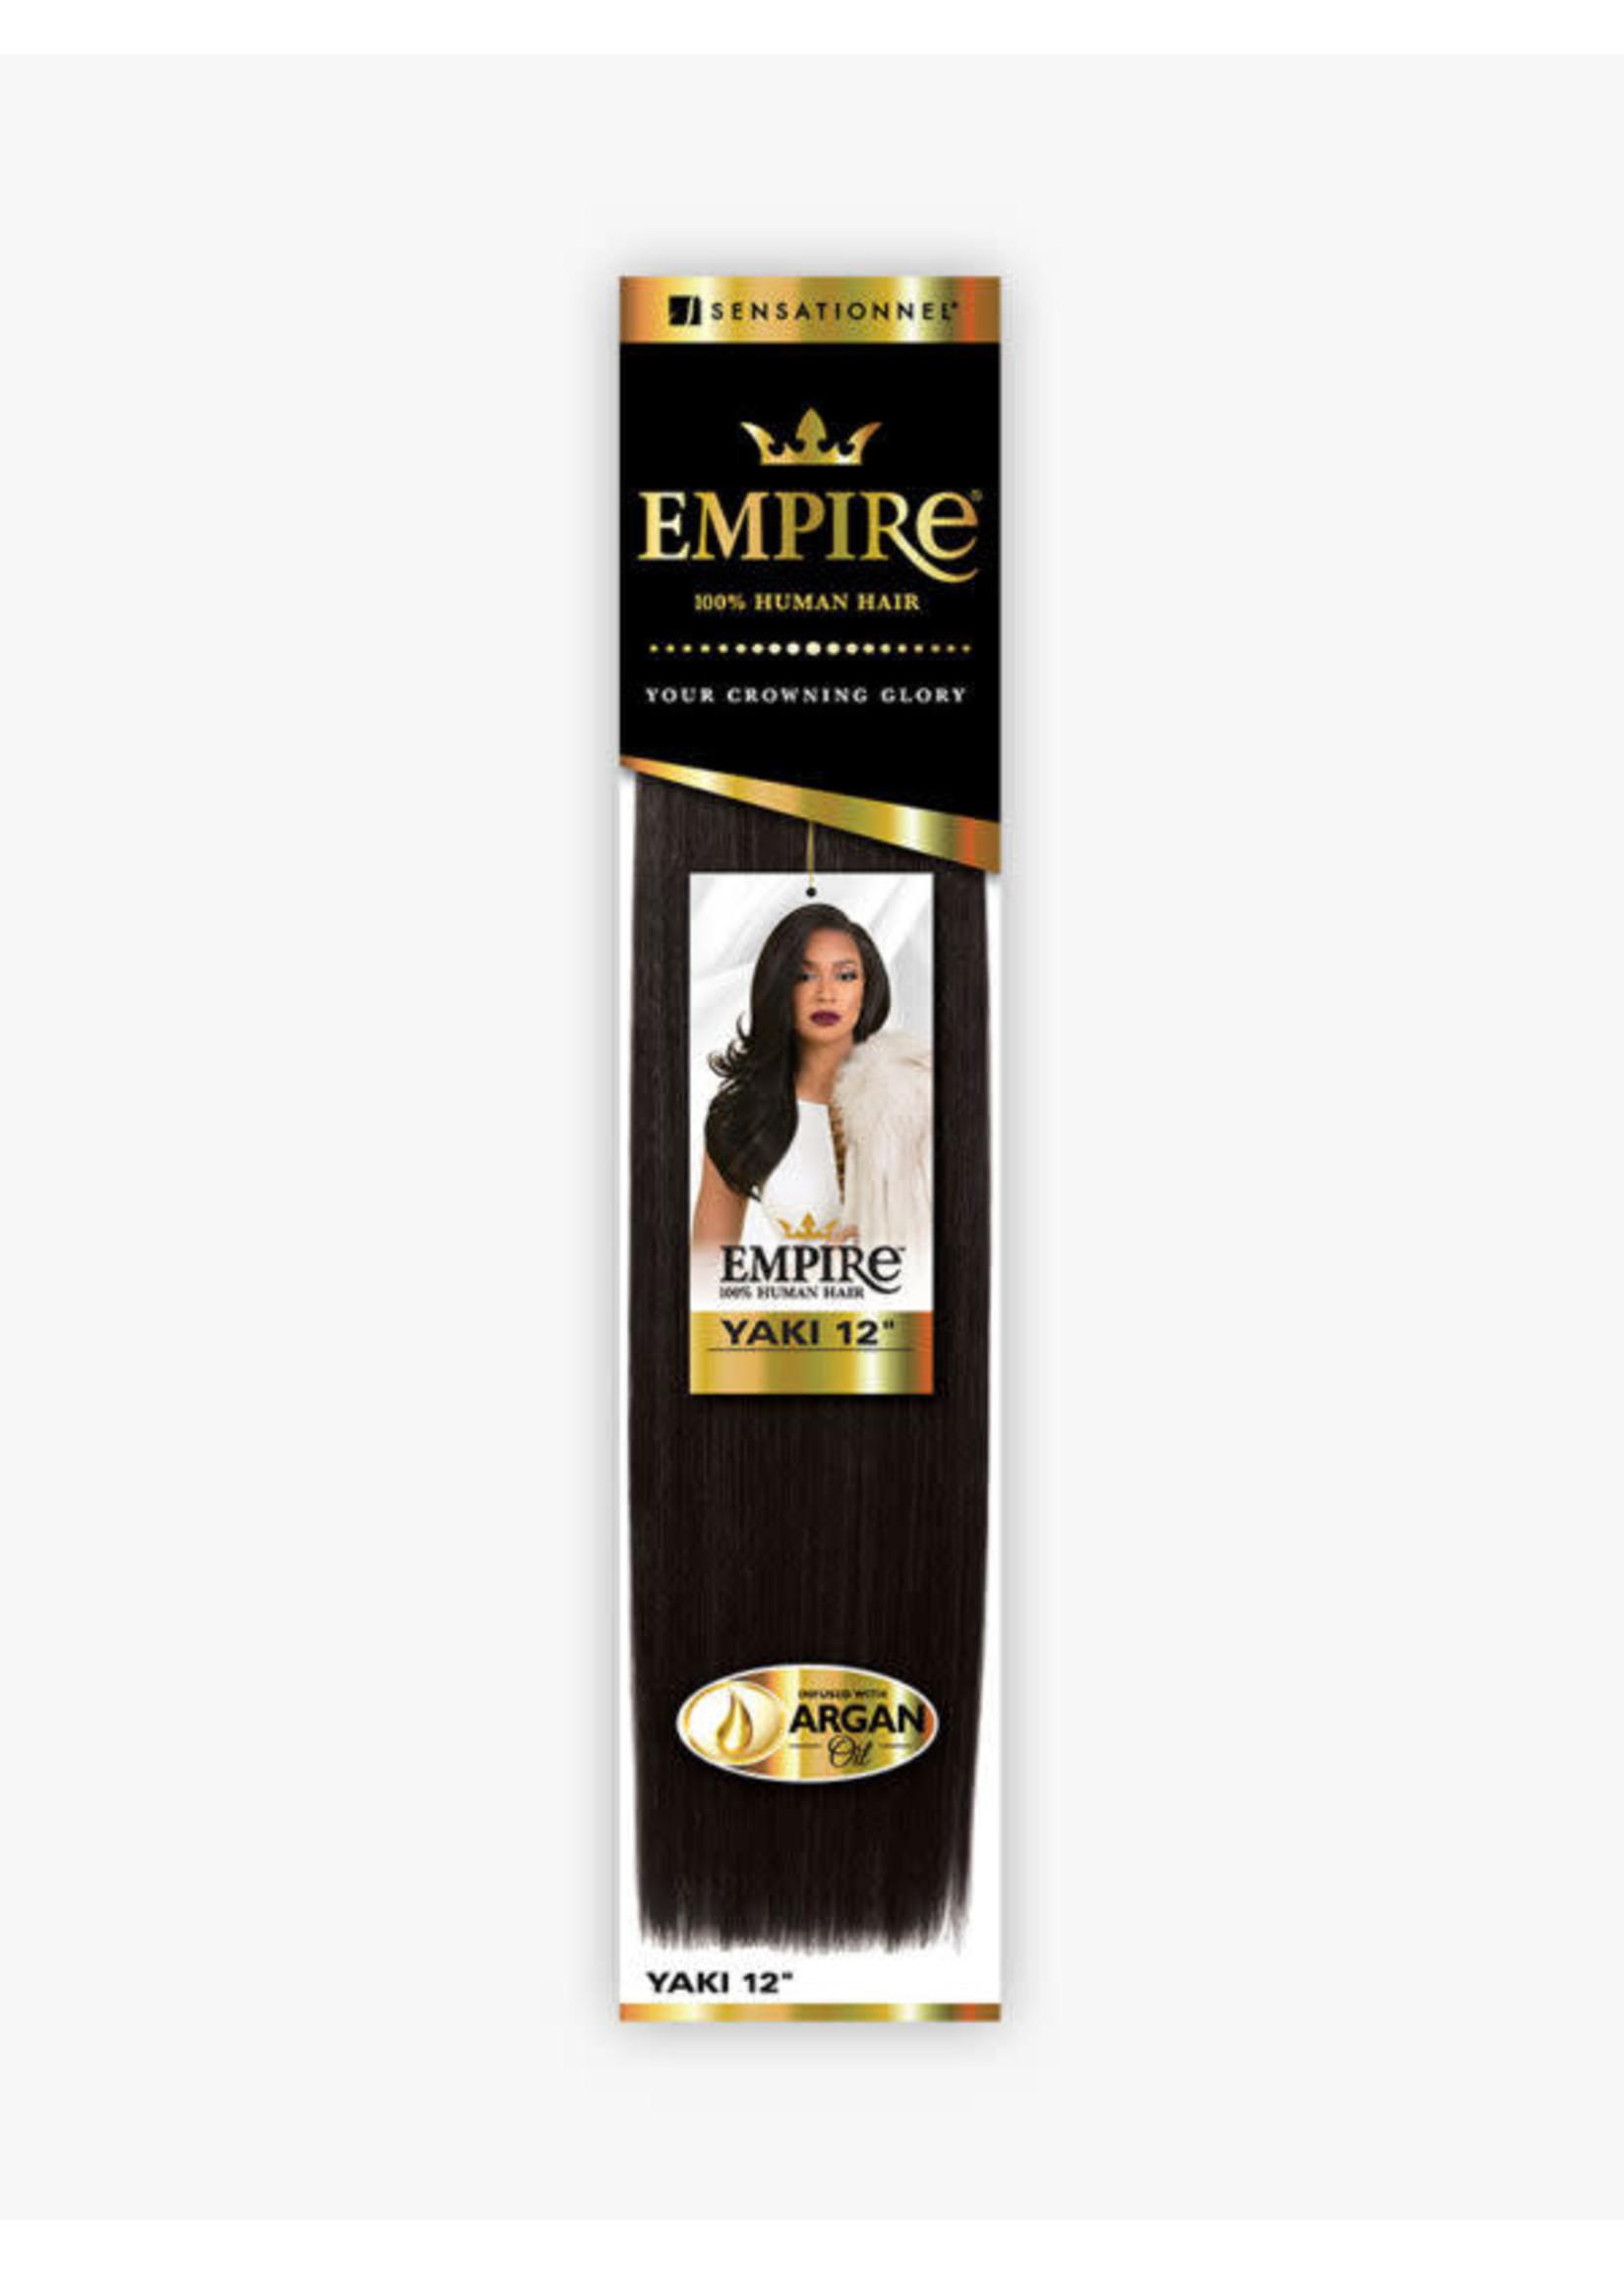 Sensationnel Empire Hair